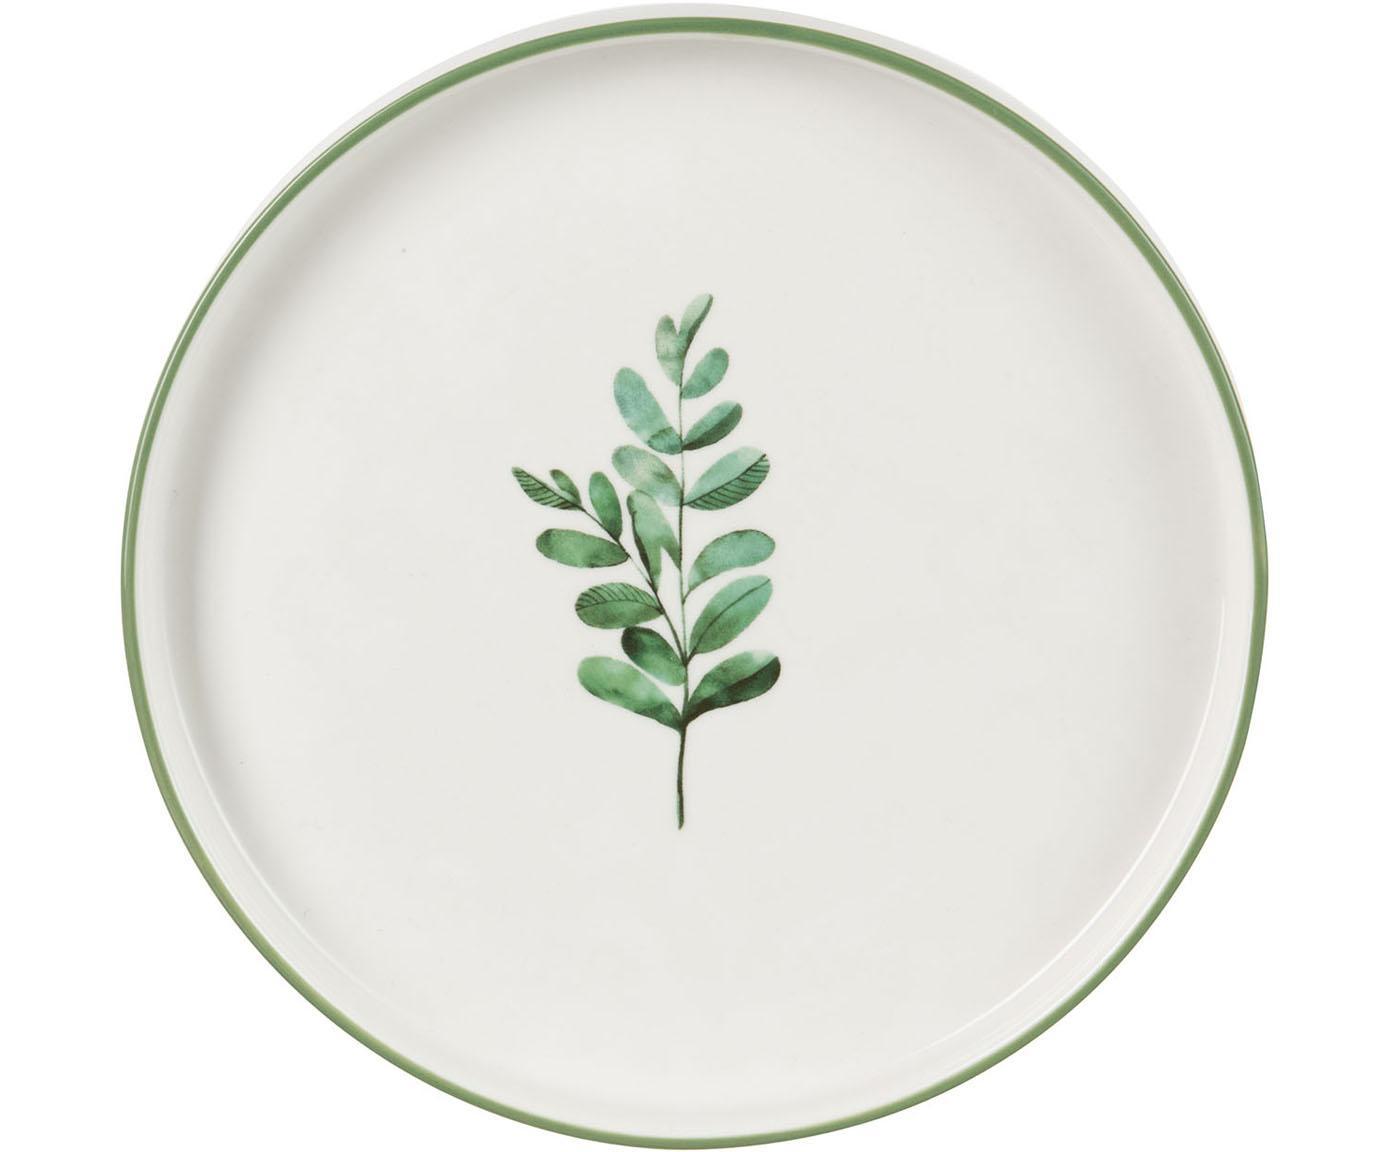 Frühstücksteller Eukalyptus mit Blatt-Motiv, 4 Stück, New Bone China, Weiß, Grün, Ø 24 cm